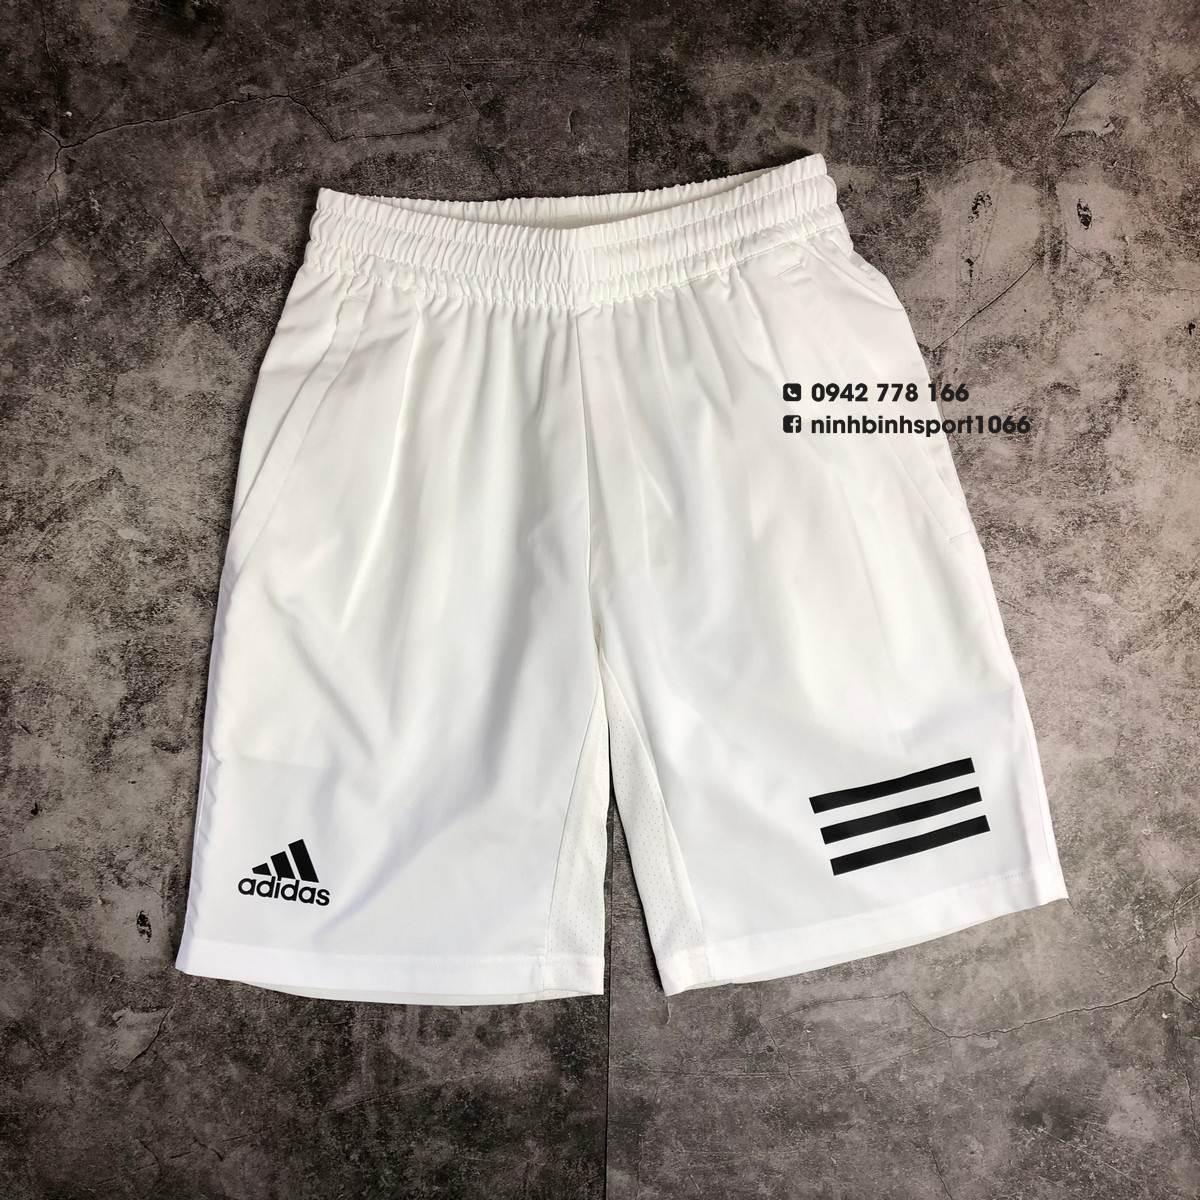 Quần short thể thao nam Adidas 3-STRIPES GL5412